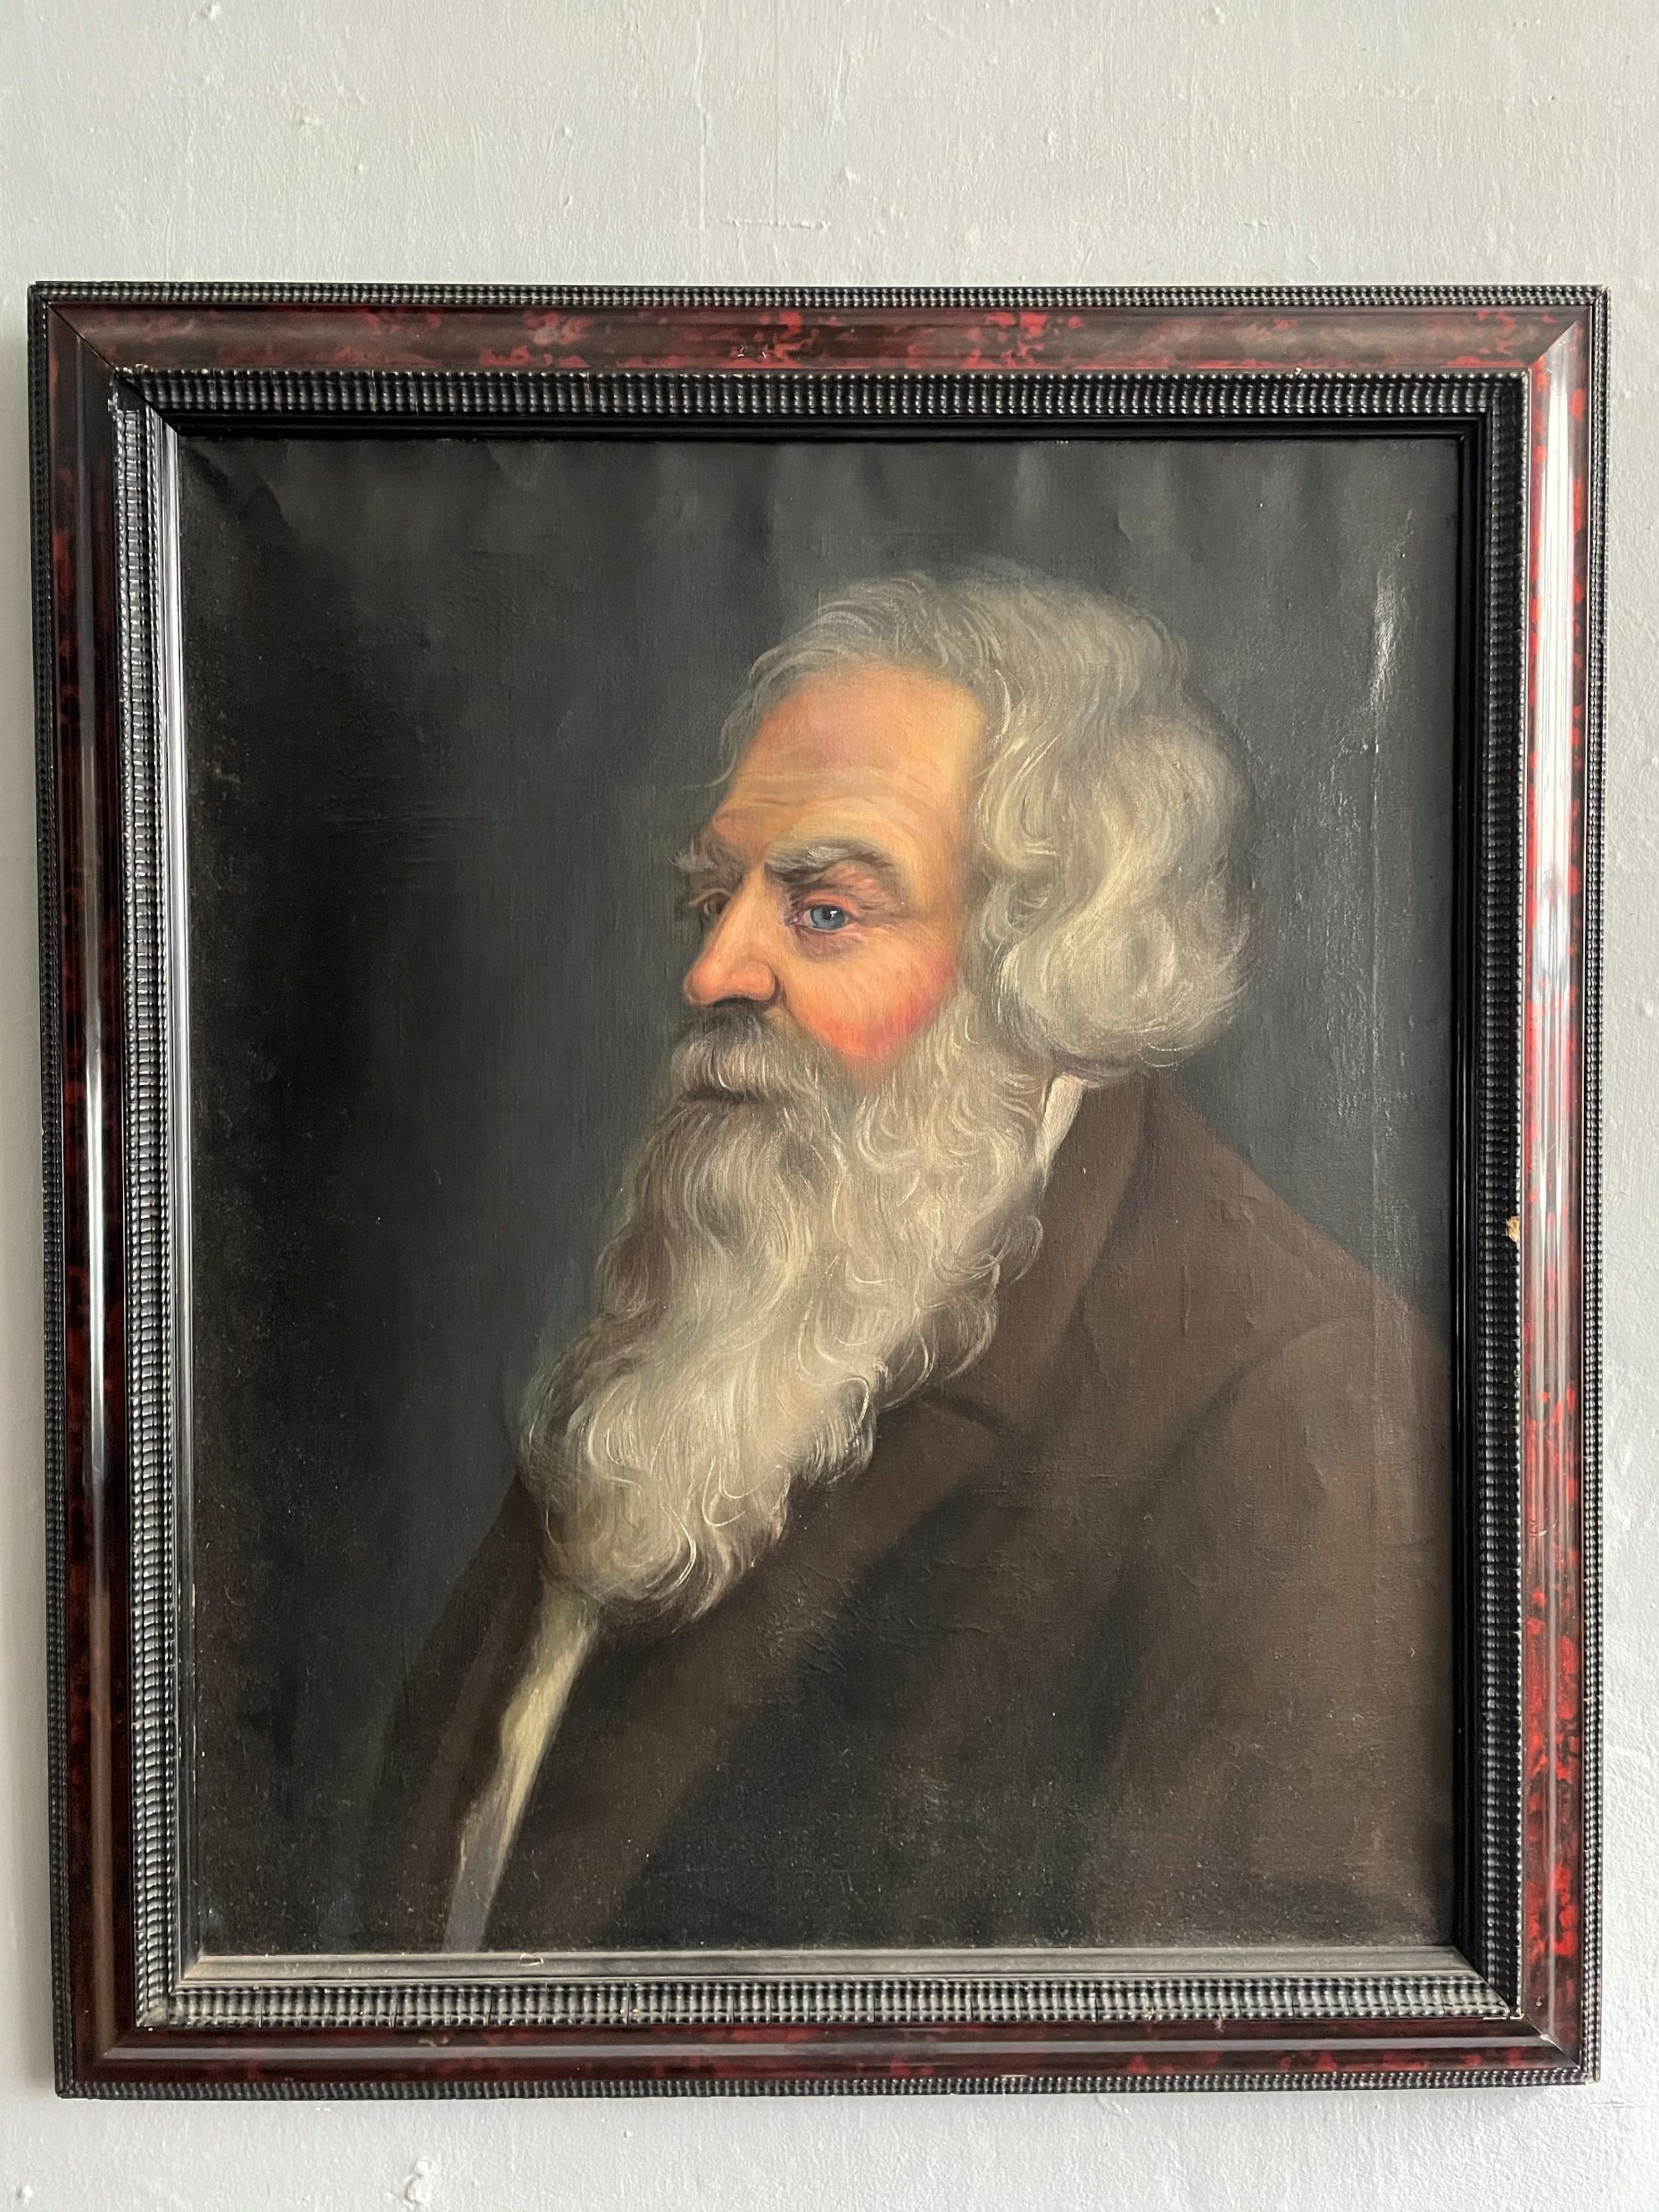 a 19thc portrait of a bearded gentleman